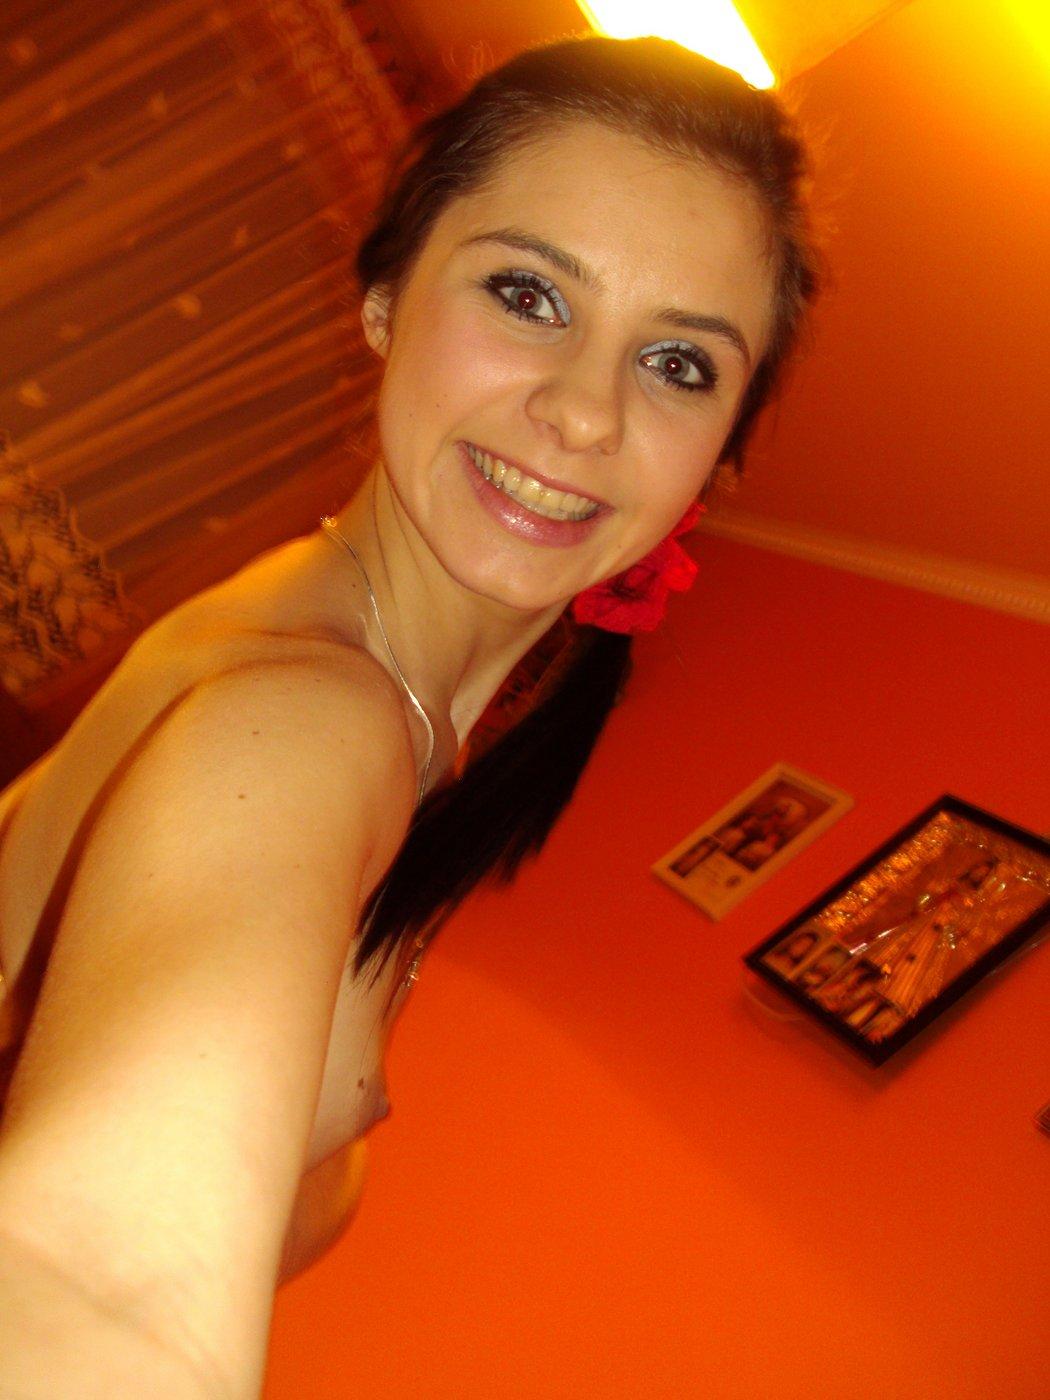 skinny-nude-amateur-young-girl-11